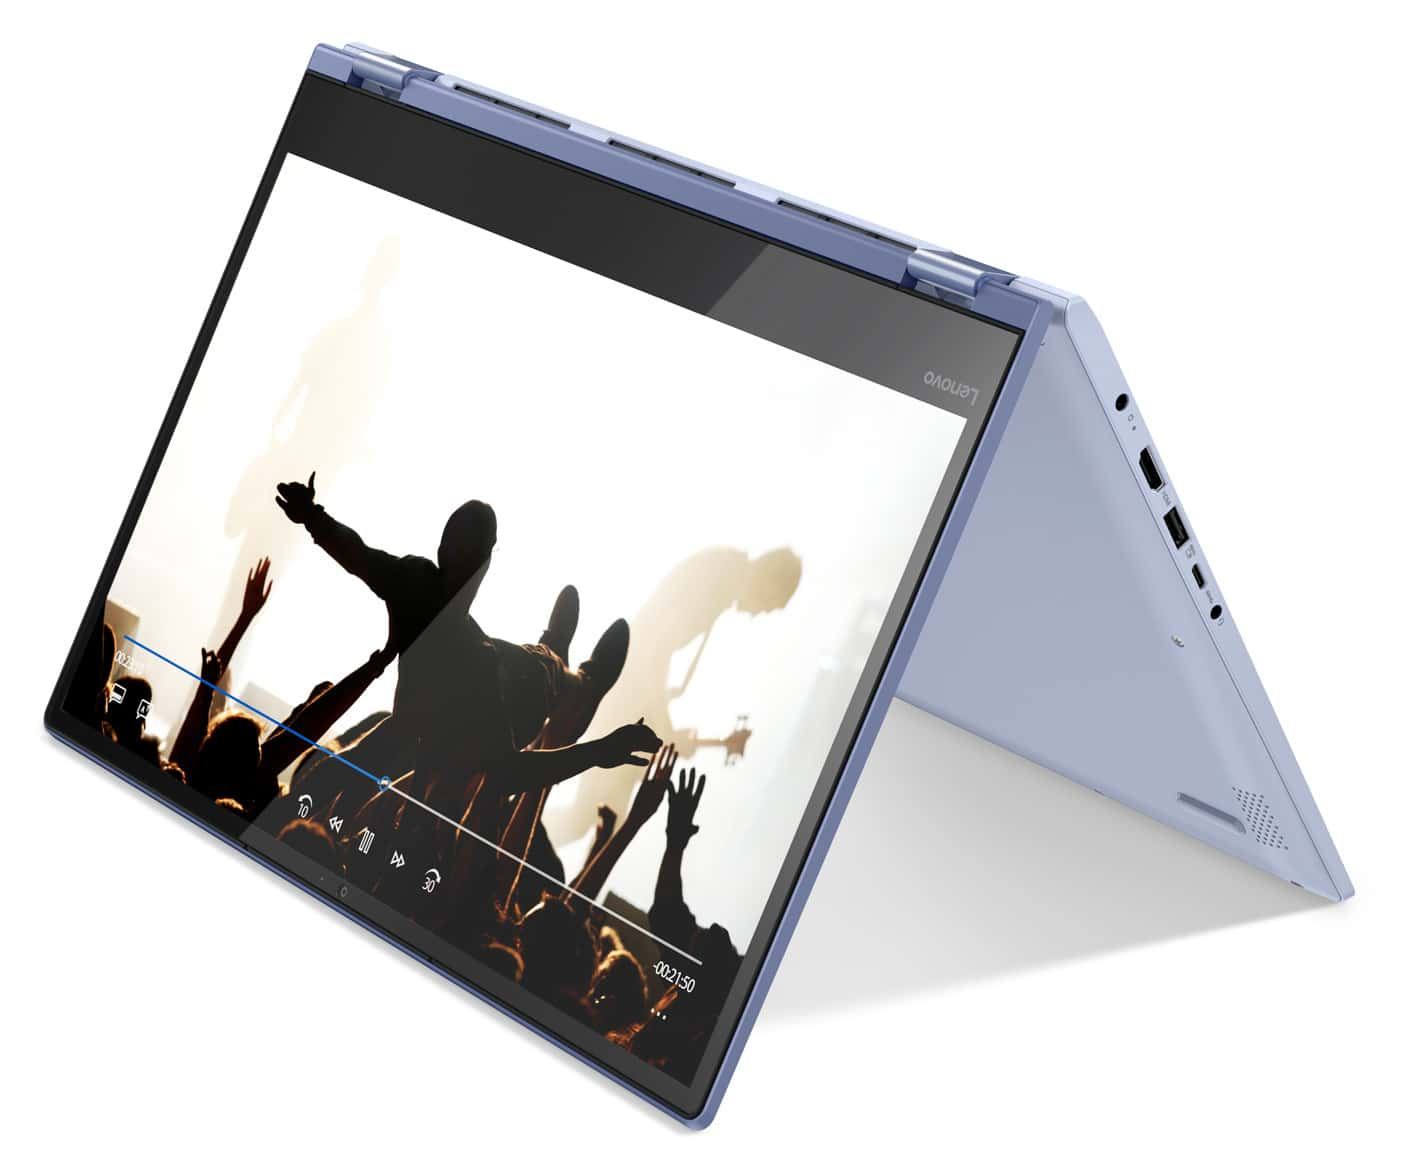 Lenovo Yoga 530-14IKB, PC tablette 14 pouces bleu (551€)